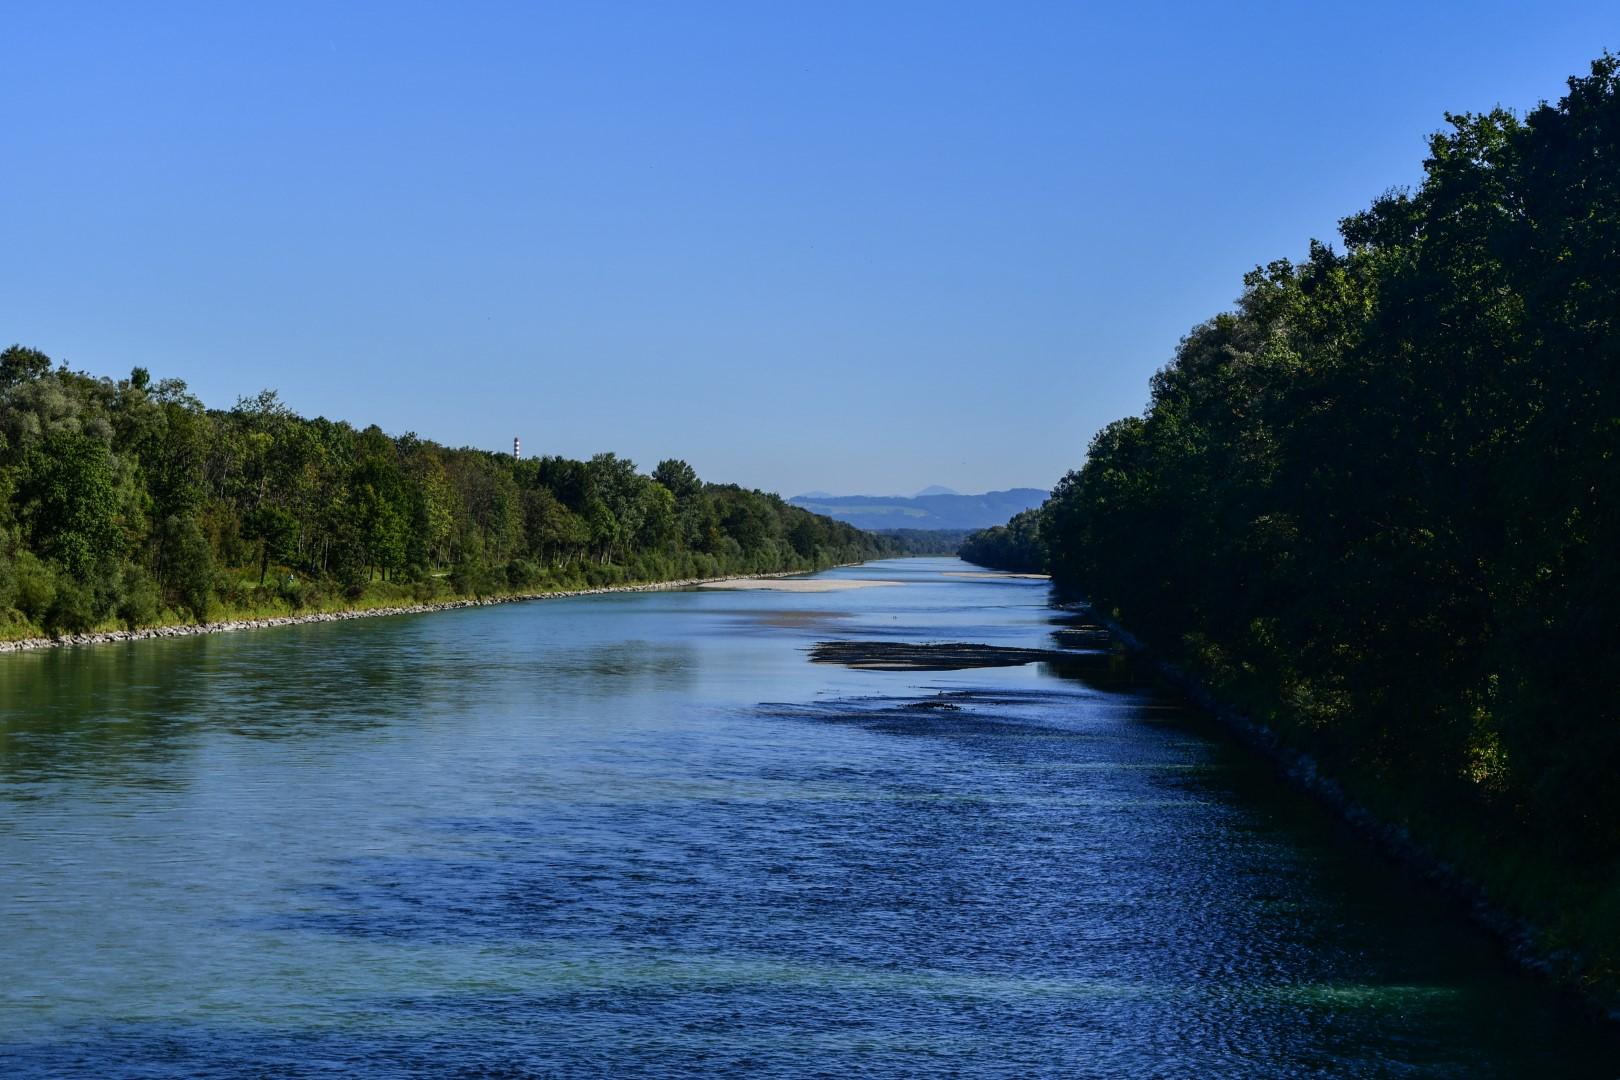 Salzachbrücke in Tittmoning